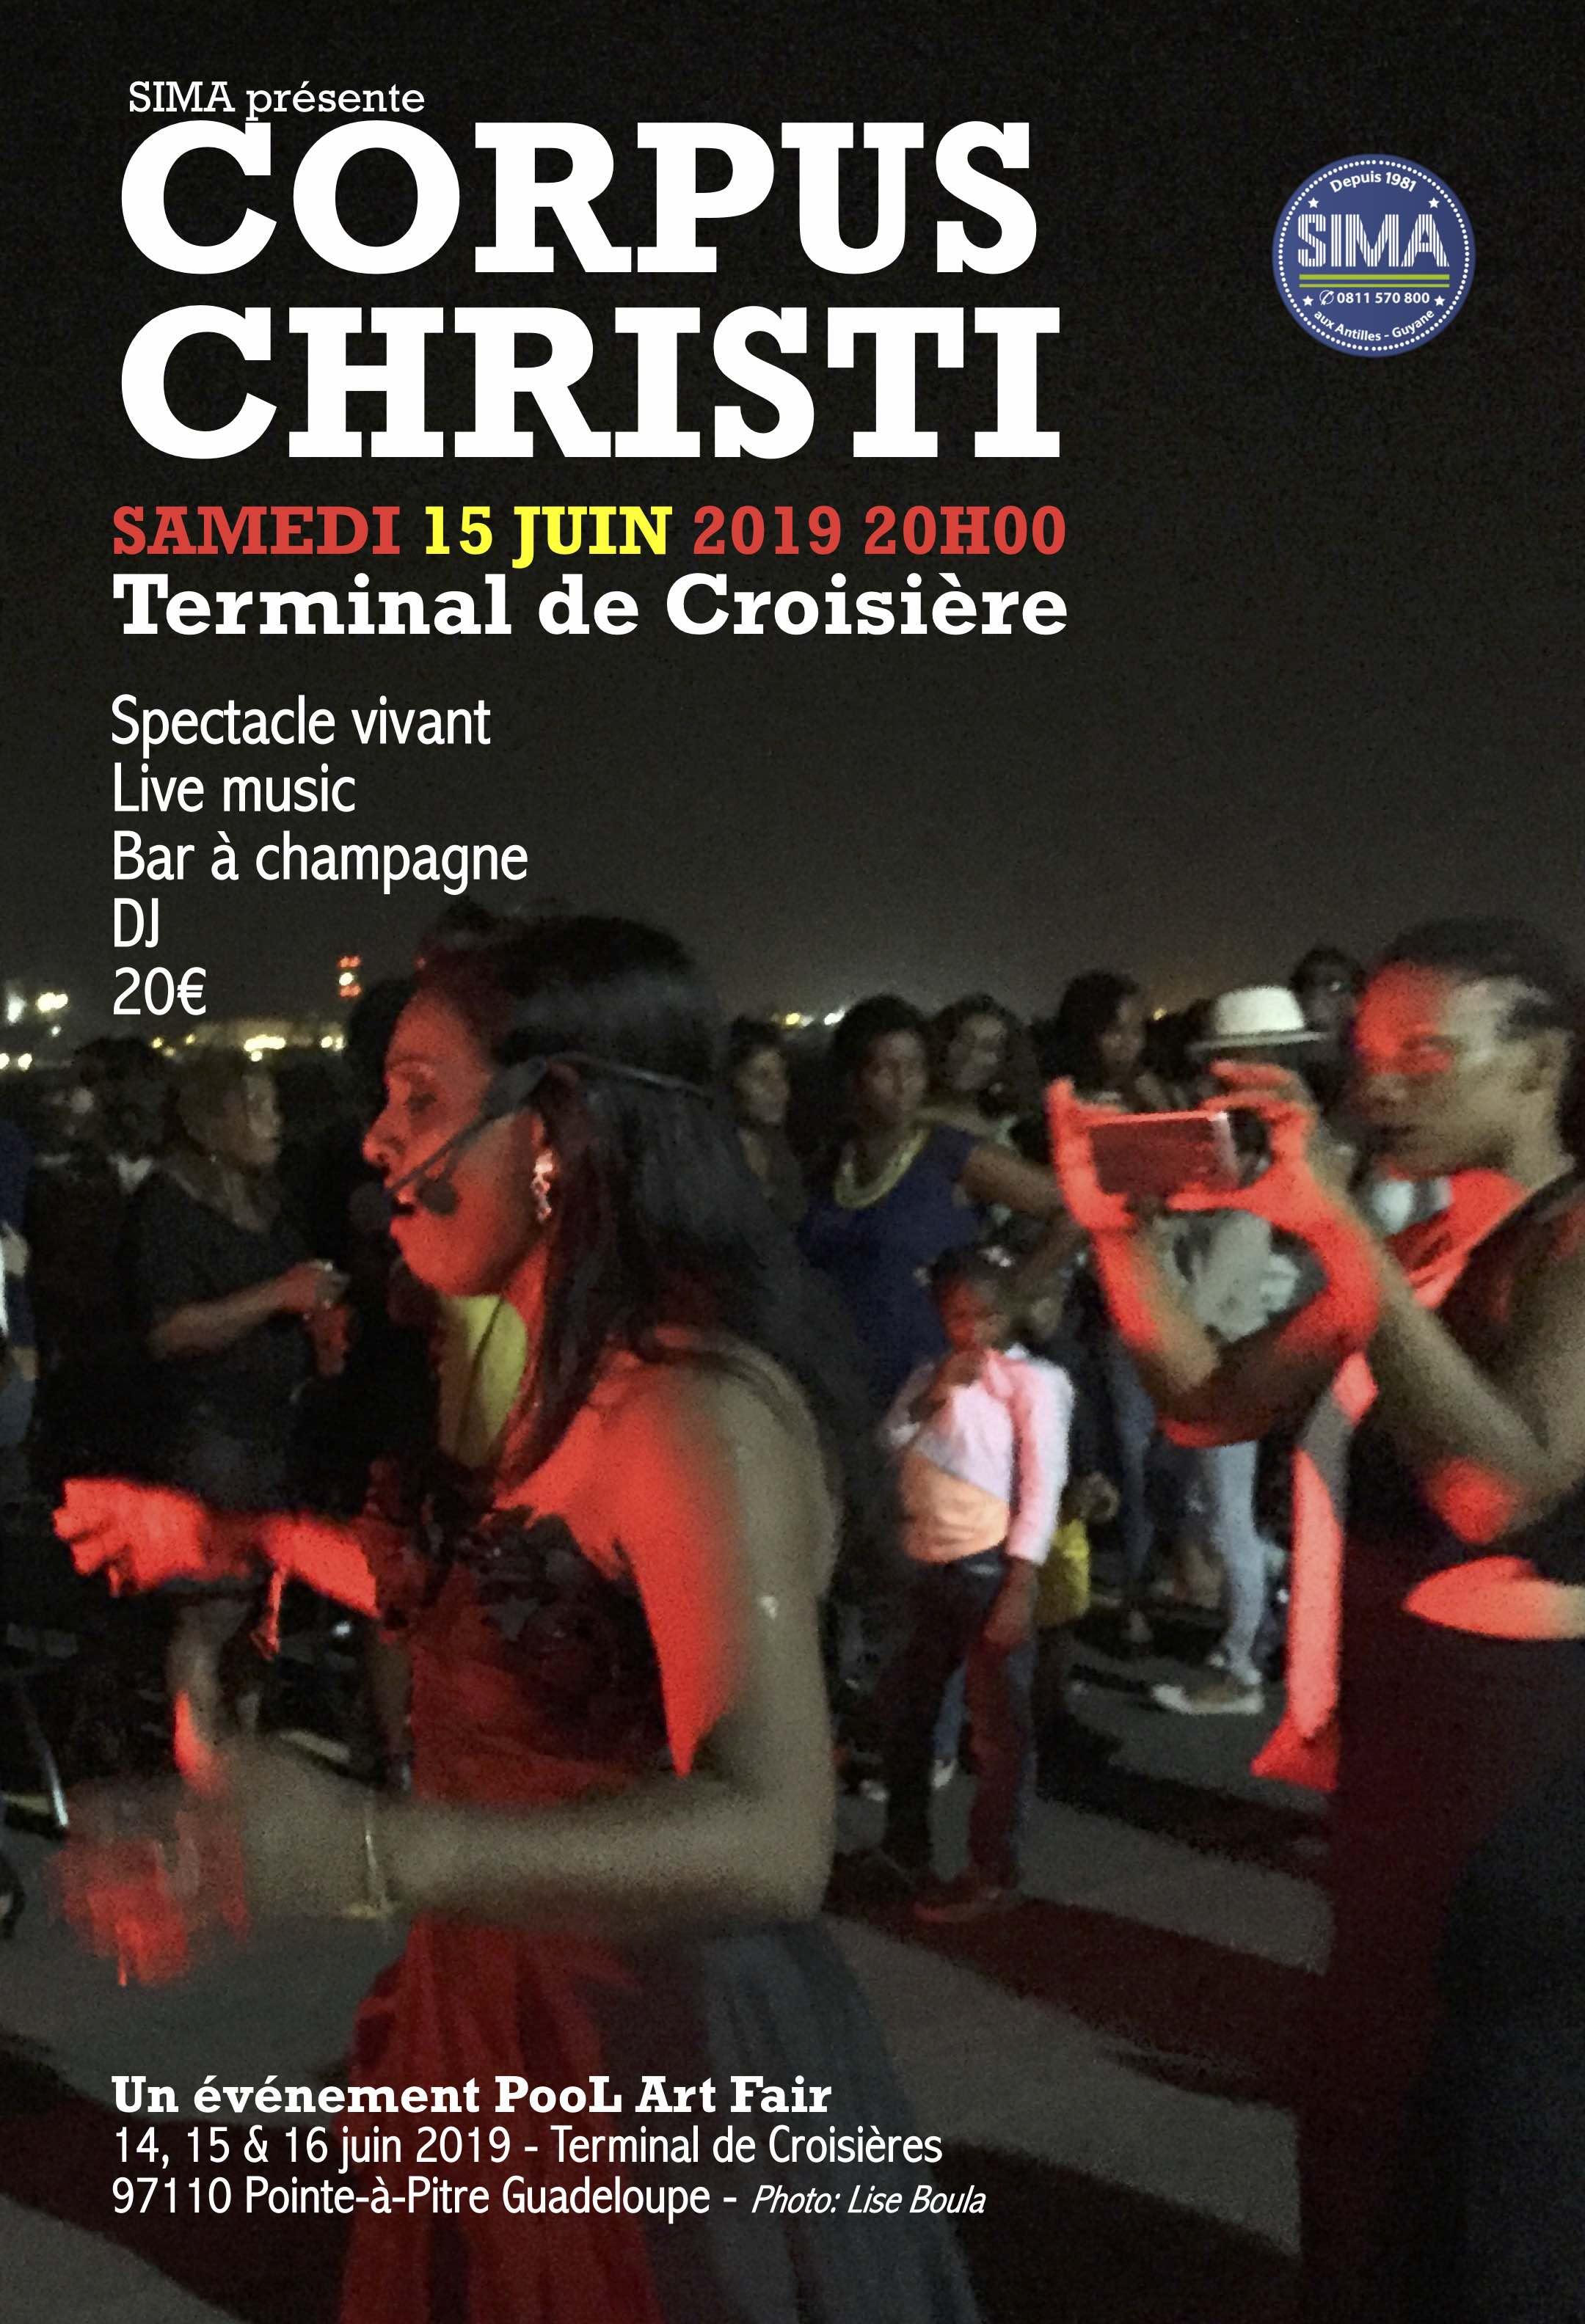 Corpus Christi Samedi 15 juin 20h00